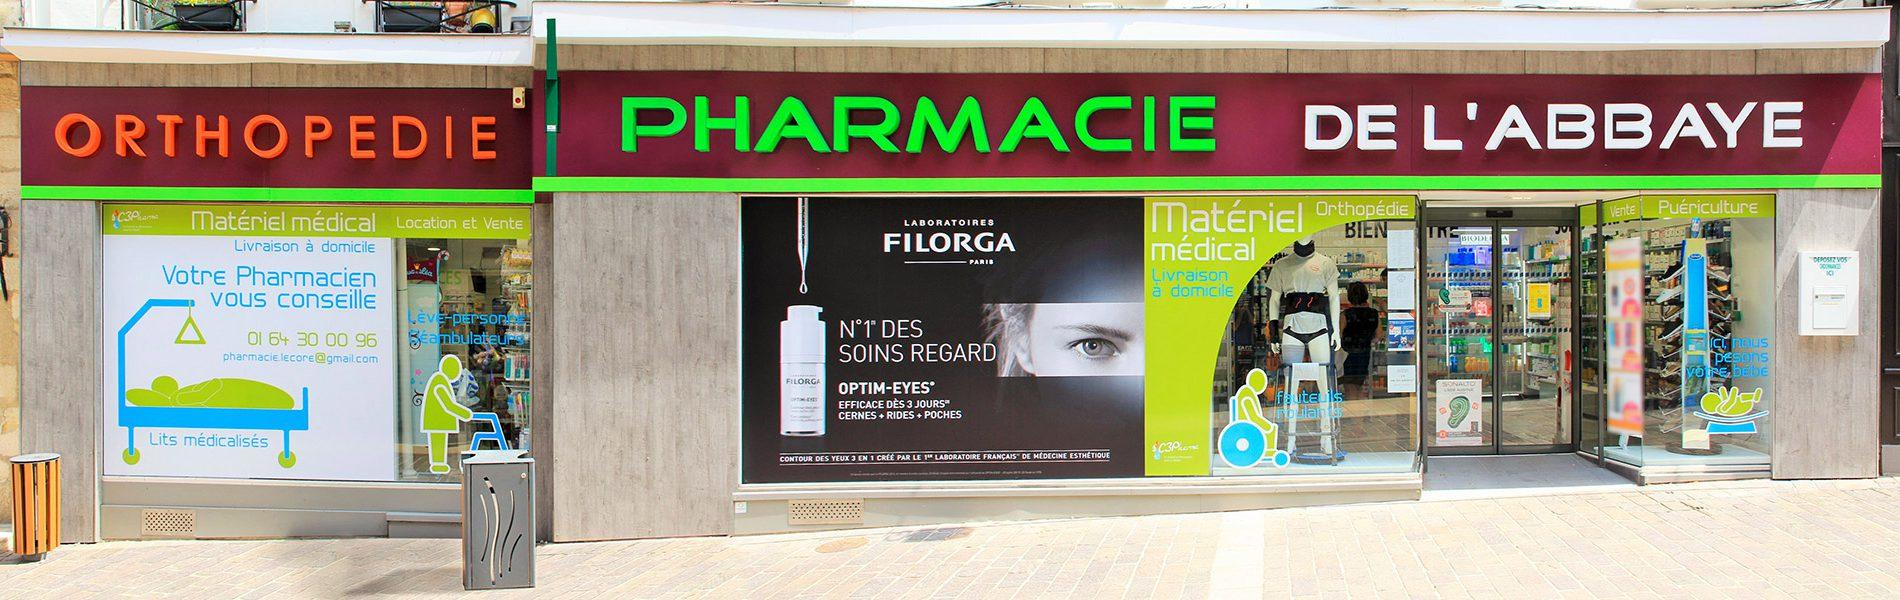 Pharmacie DE L'ABBAYE - Image Homepage 1